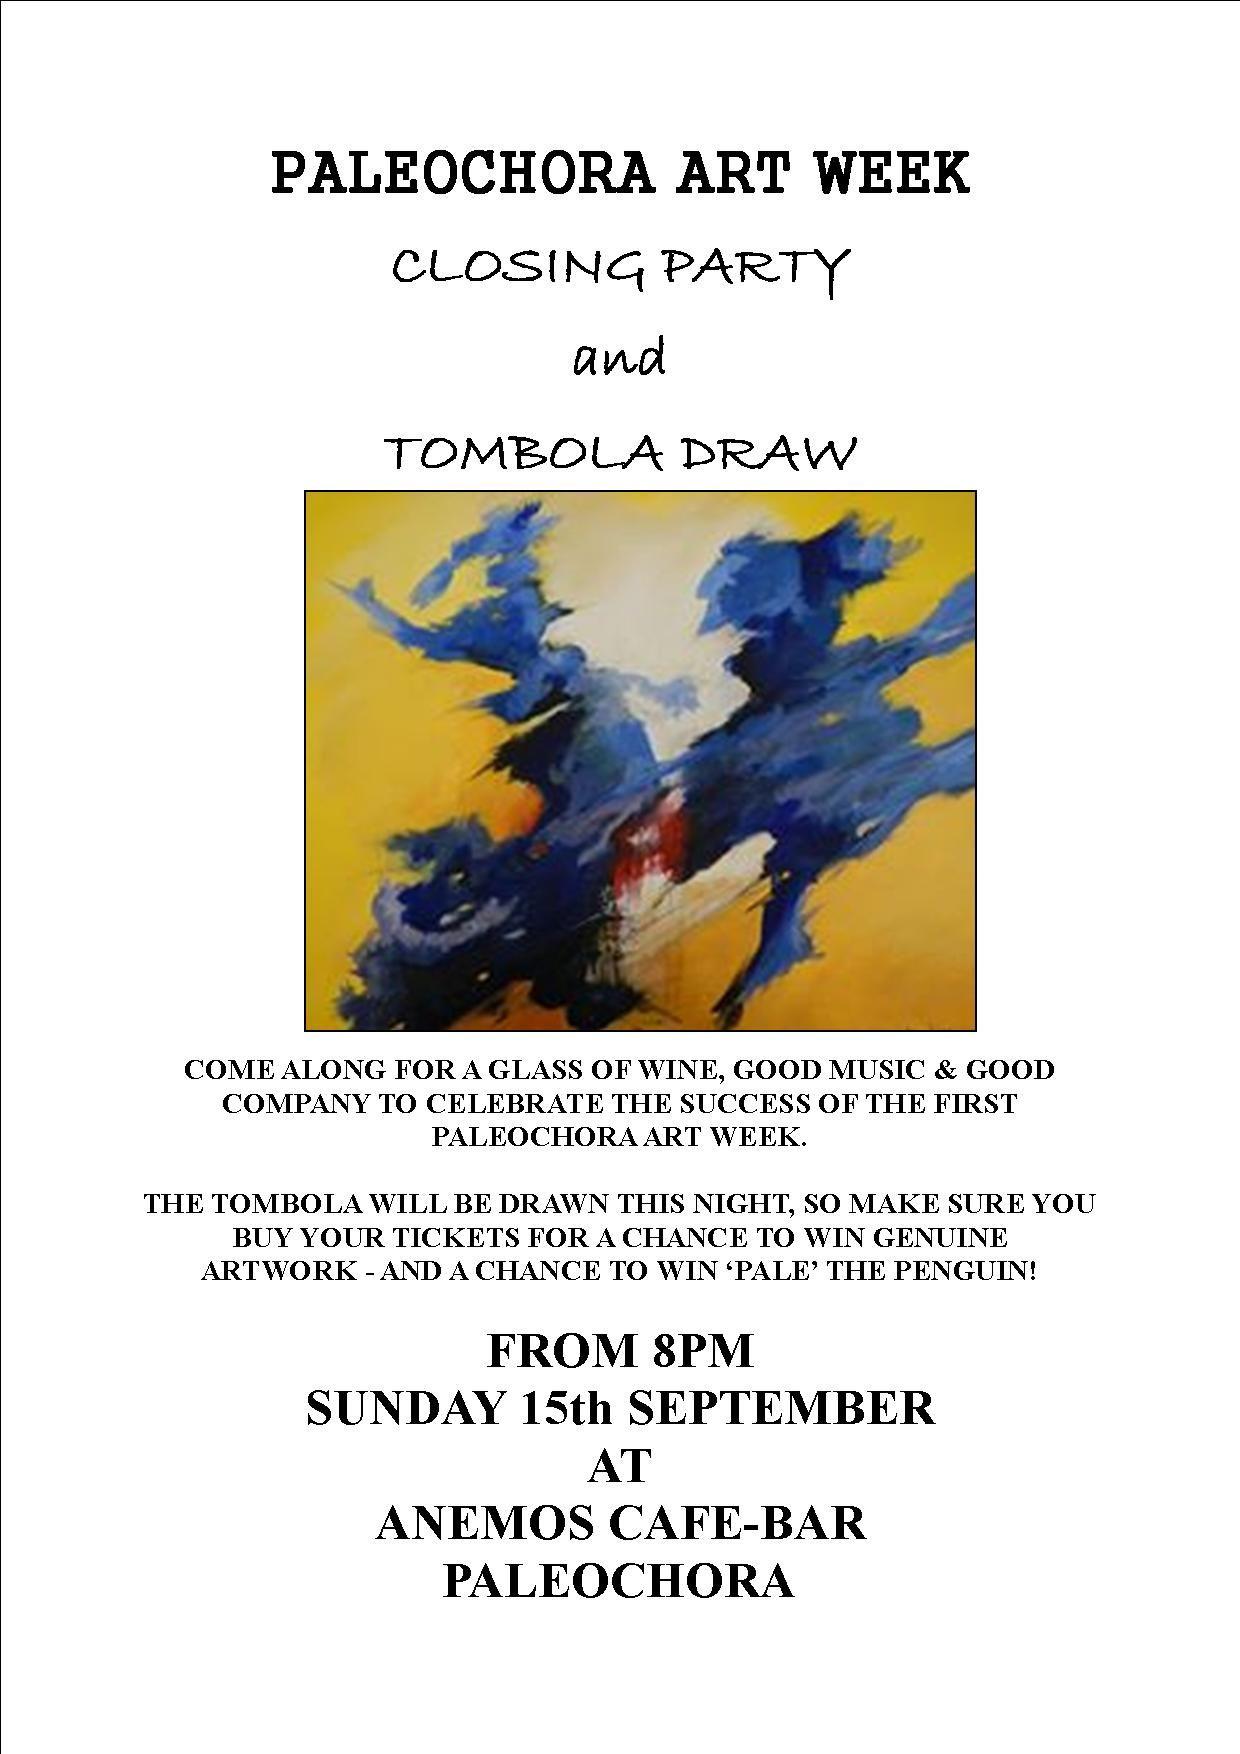 Closing Party Art Week